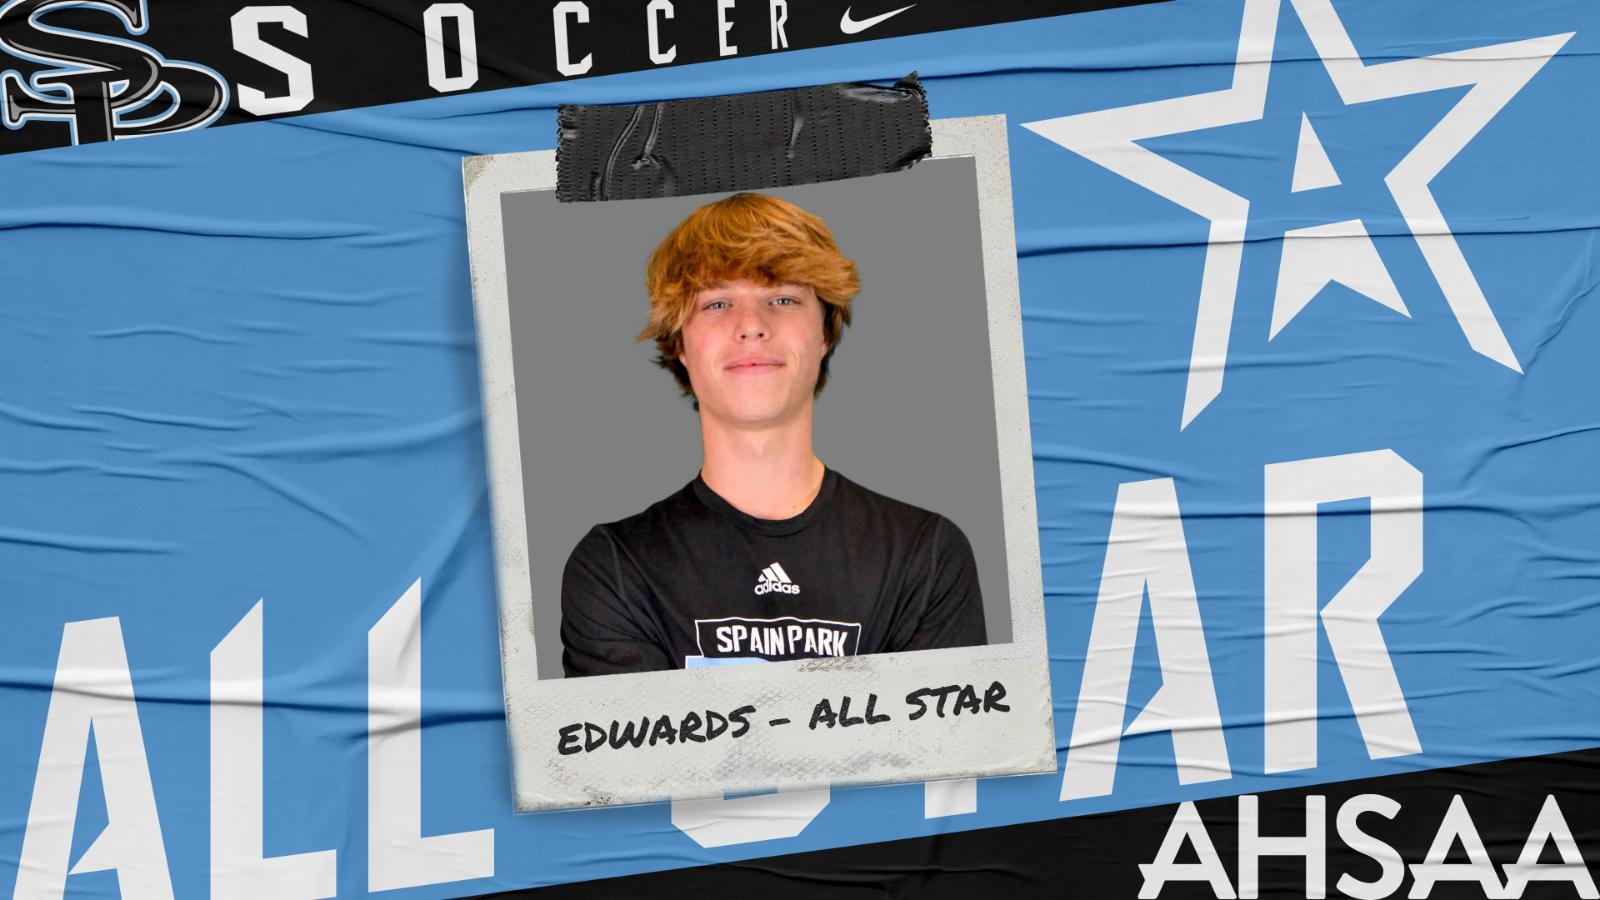 Edwards Named to AHSAA All-Star Soccer Team